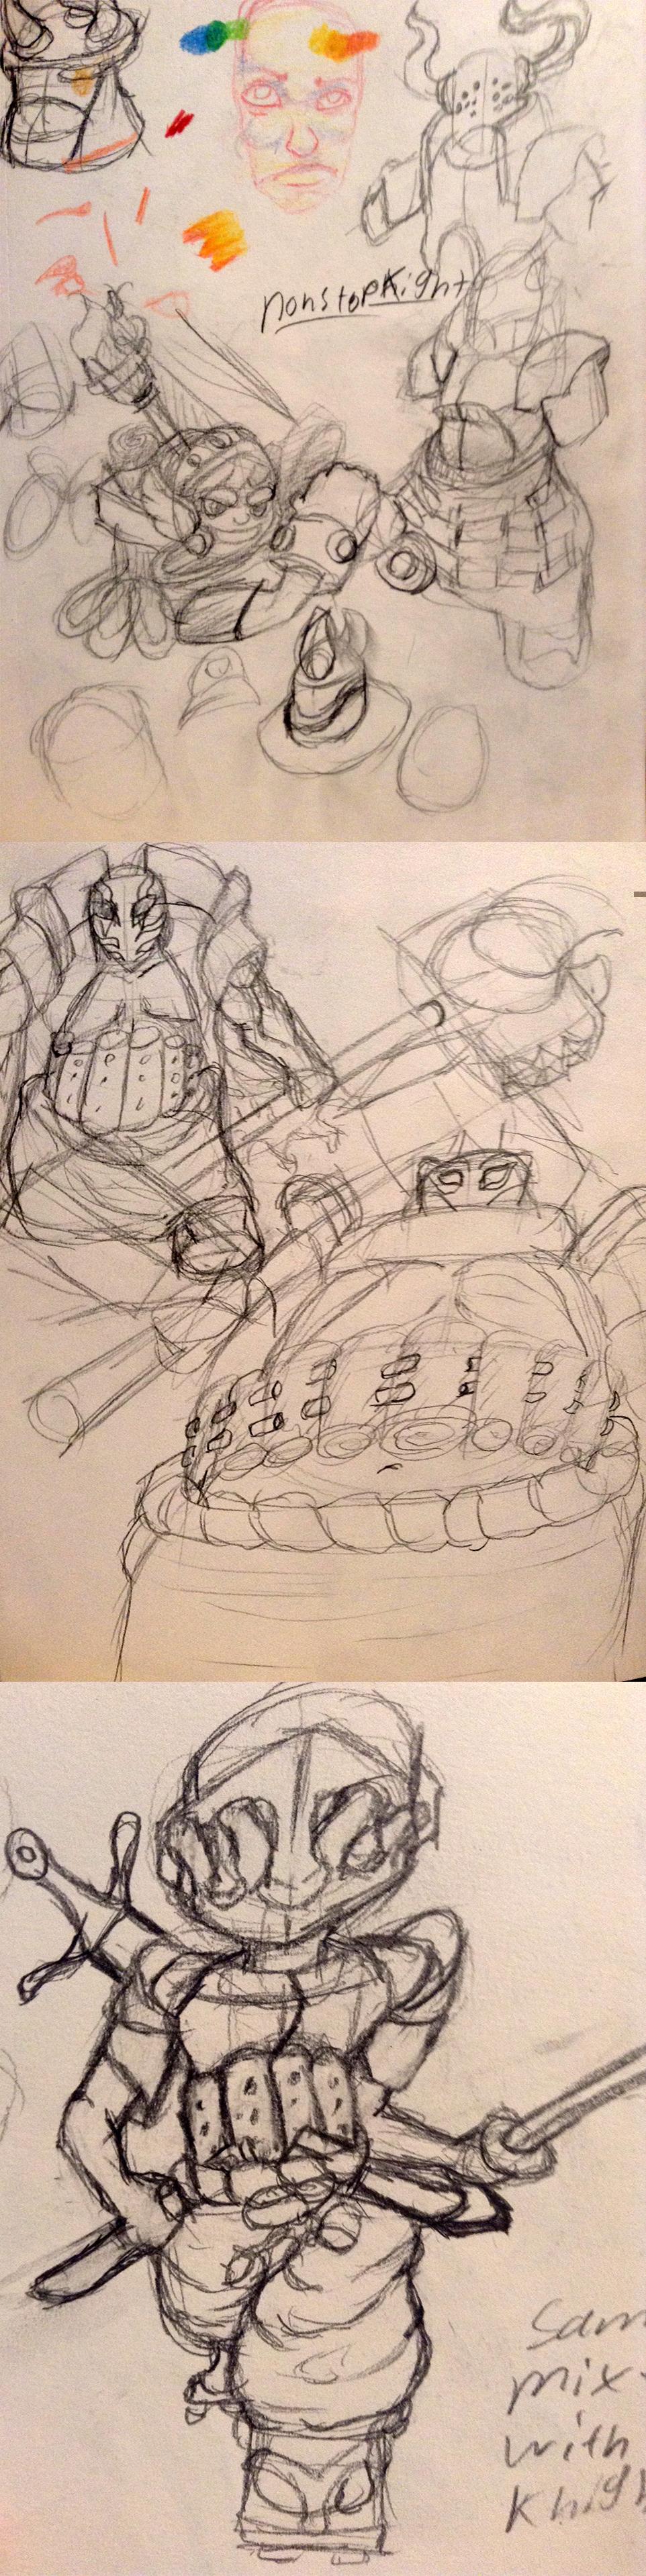 hero and pet wip sketch